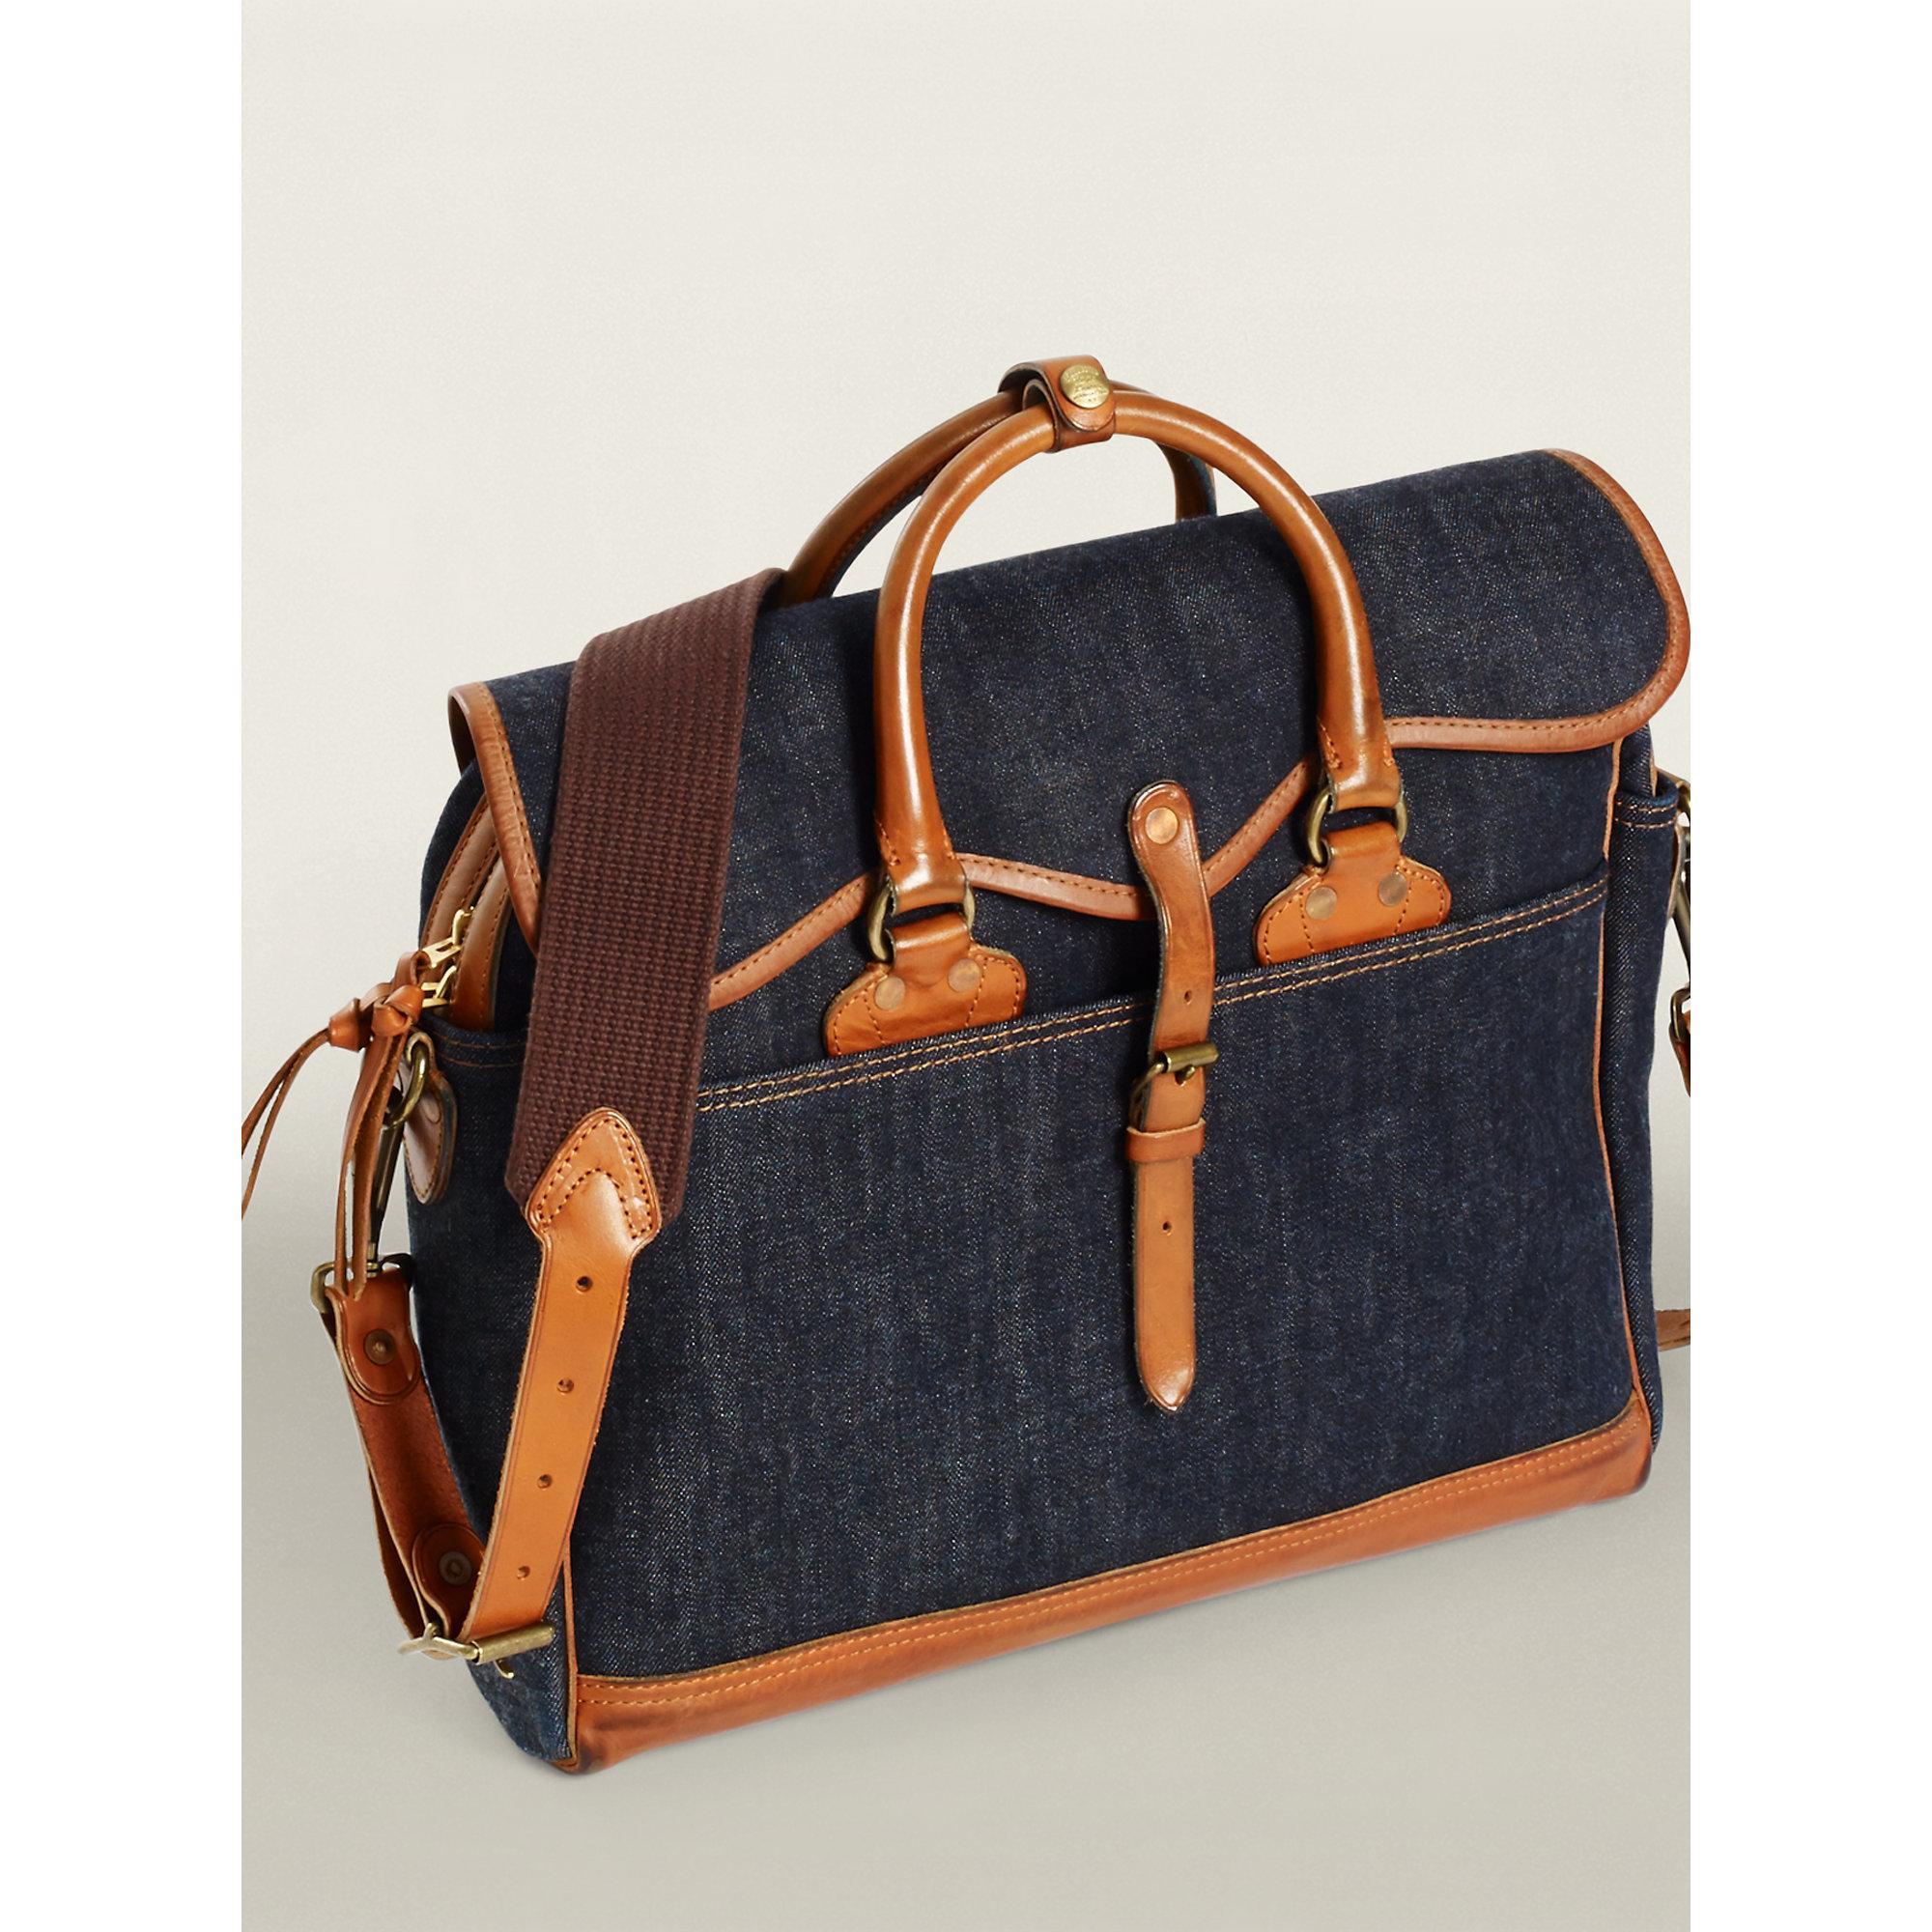 98a8a7a6d2 Lyst - RRL Emerson Shoulder Bag in Blue for Men